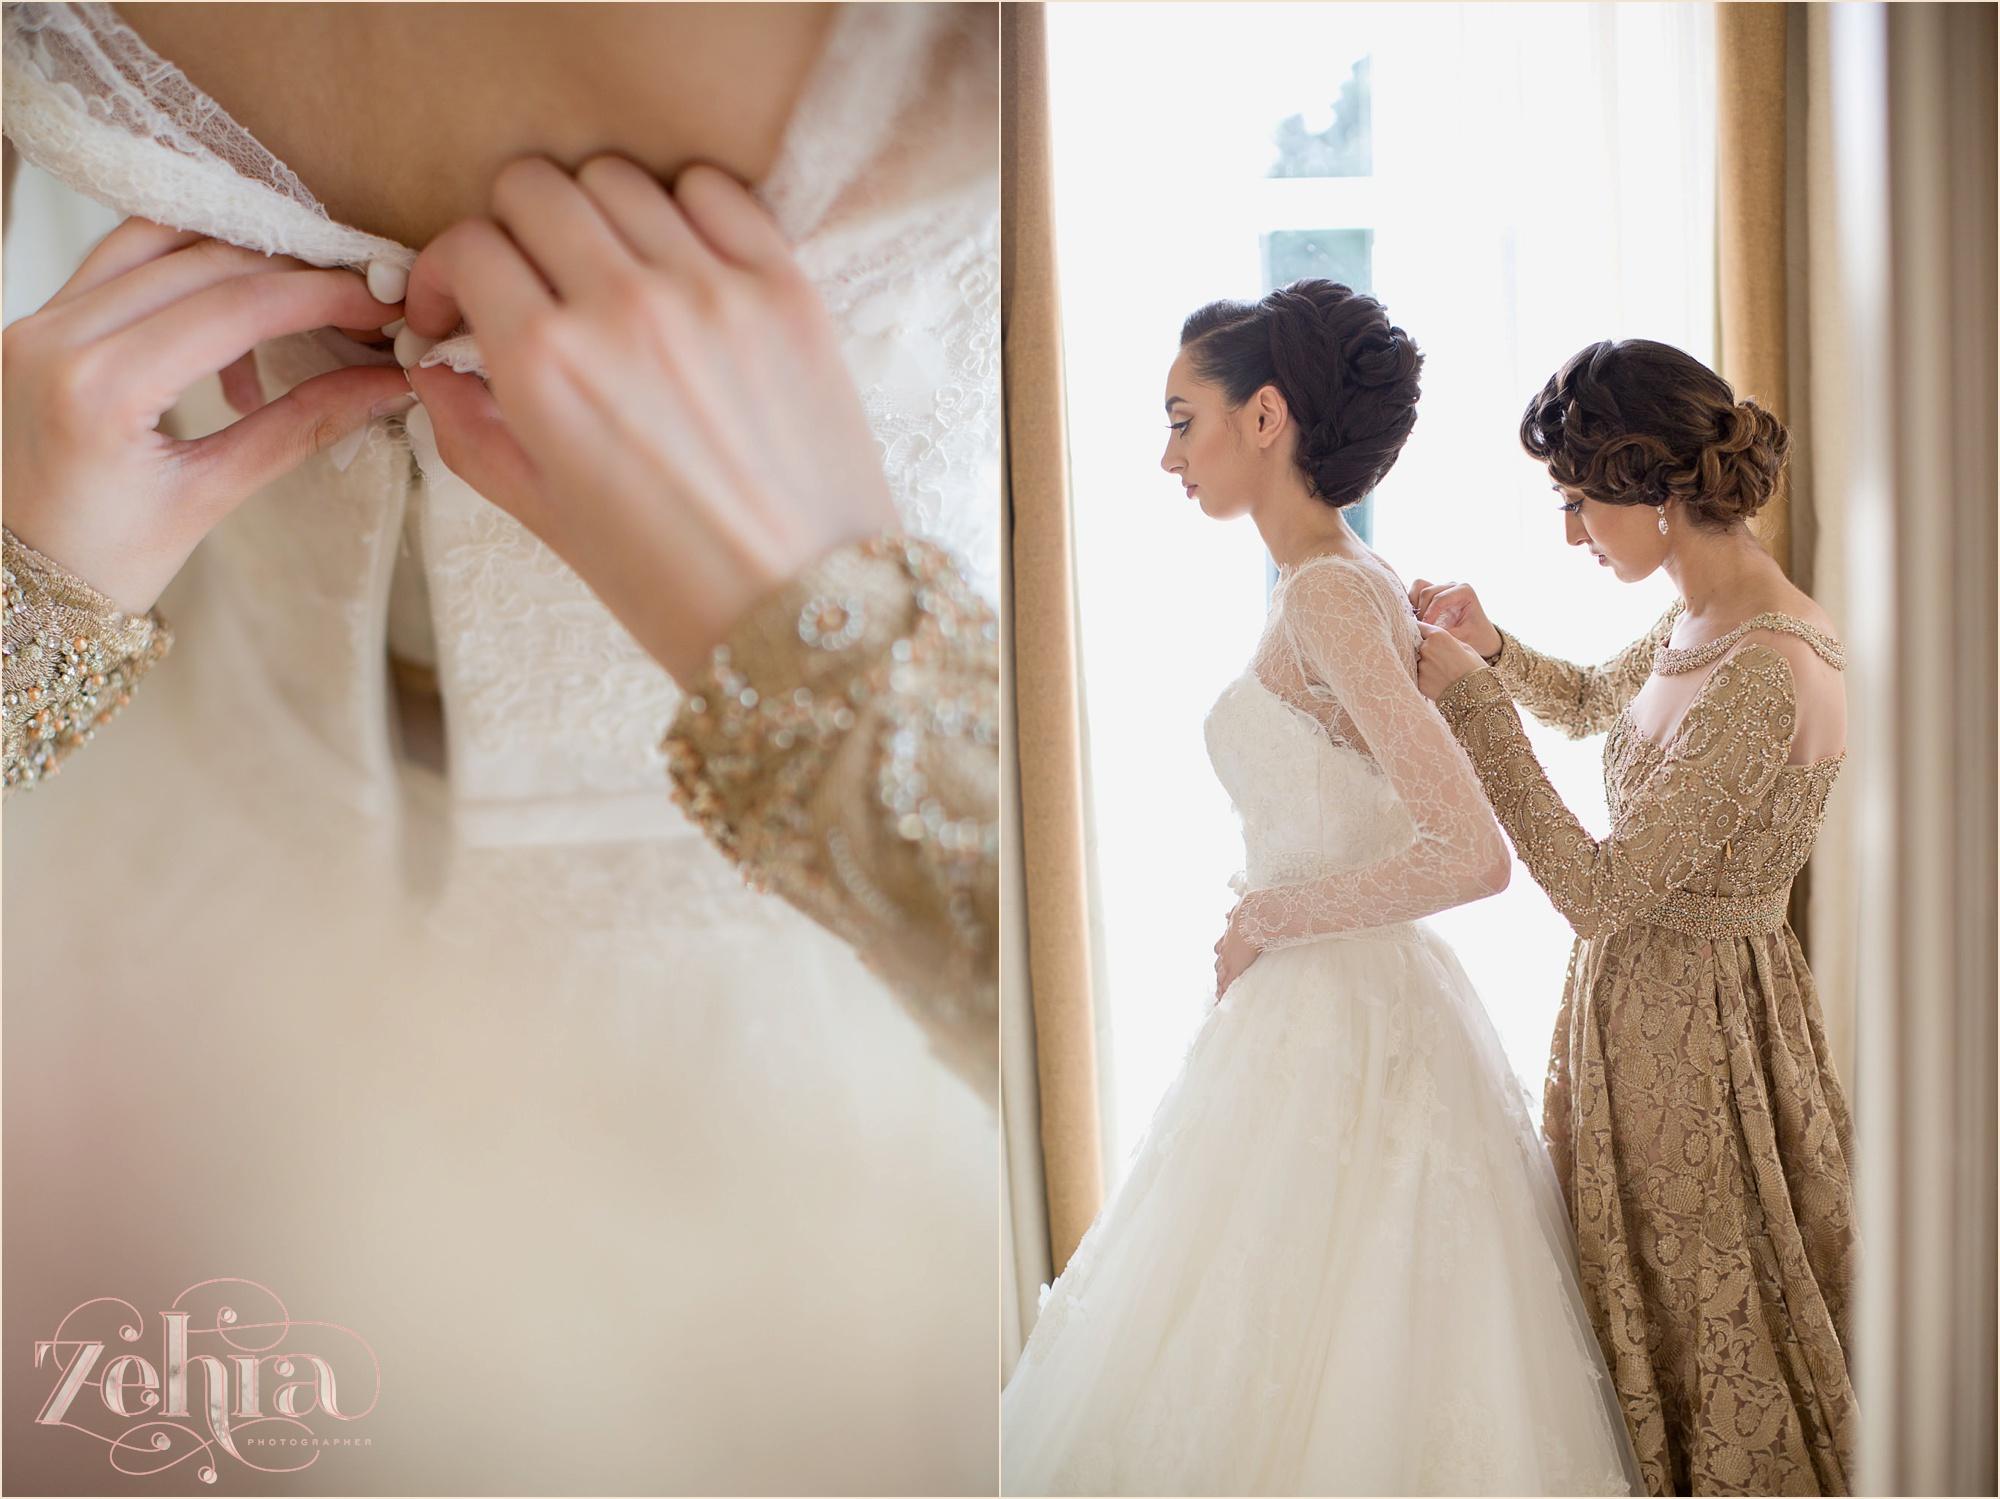 jasira manchester wedding photographer_0009.jpg